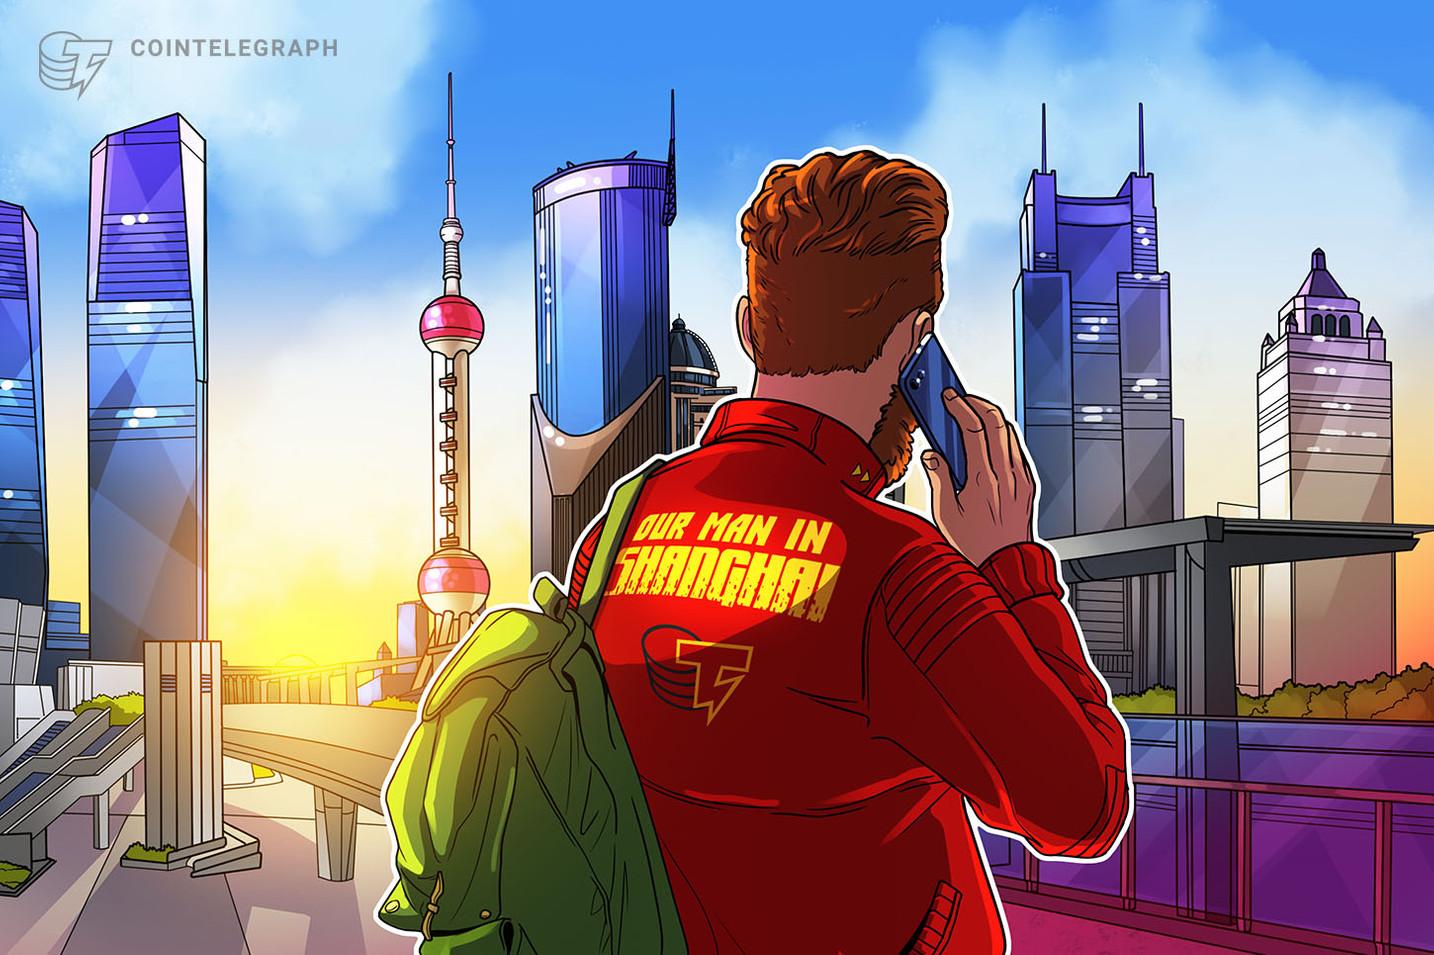 Shanghai Man: Fight crypto like COVID-19 urges Global Times, hydro power plants popular ...